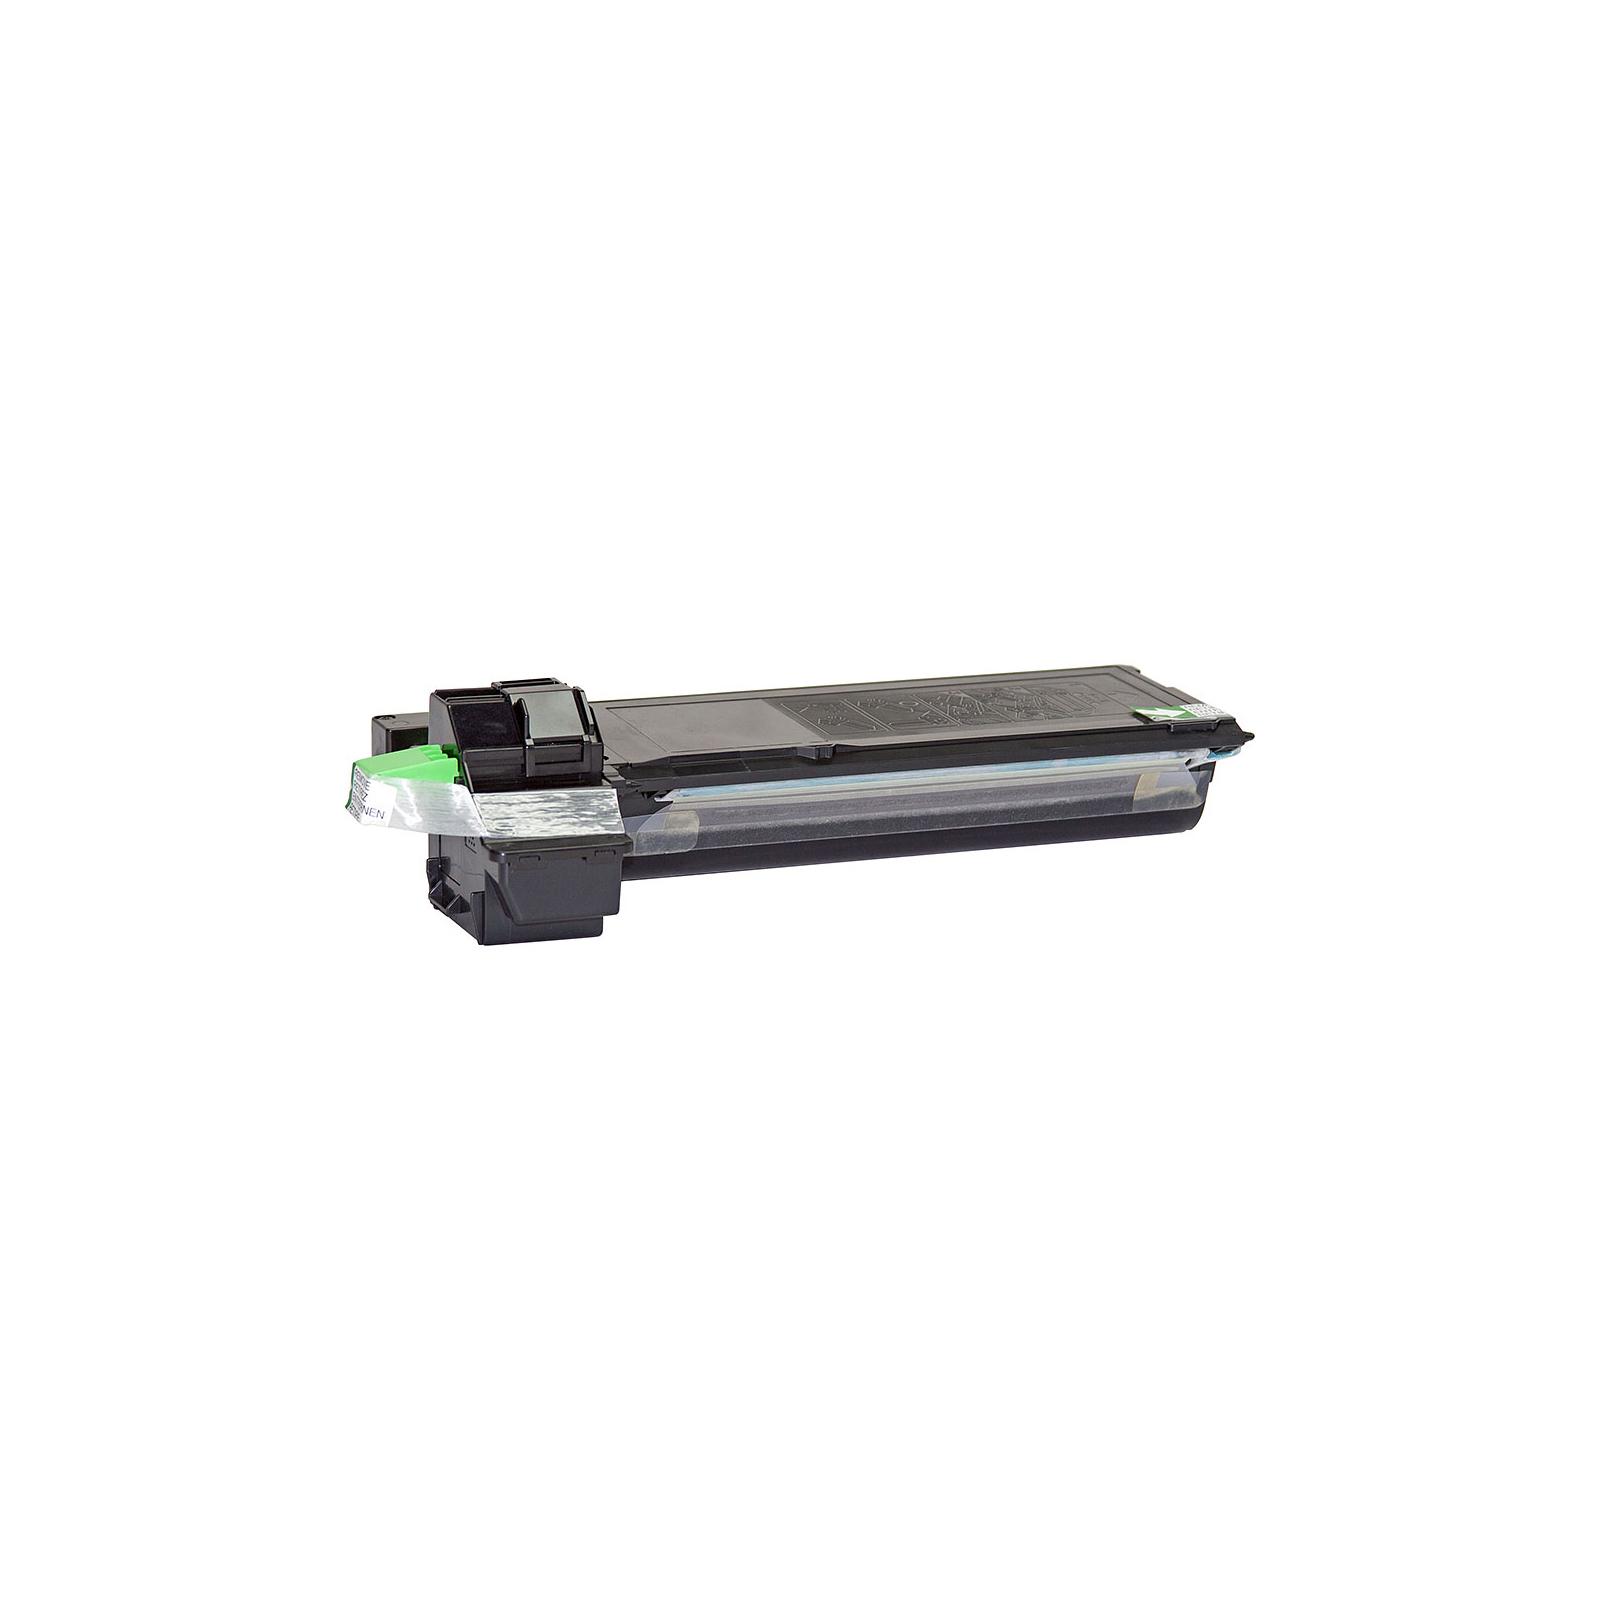 Тонер-картридж VTC TOSHIBA T-1200/E-STUDIO 12/15/120/150 (T1200EV)